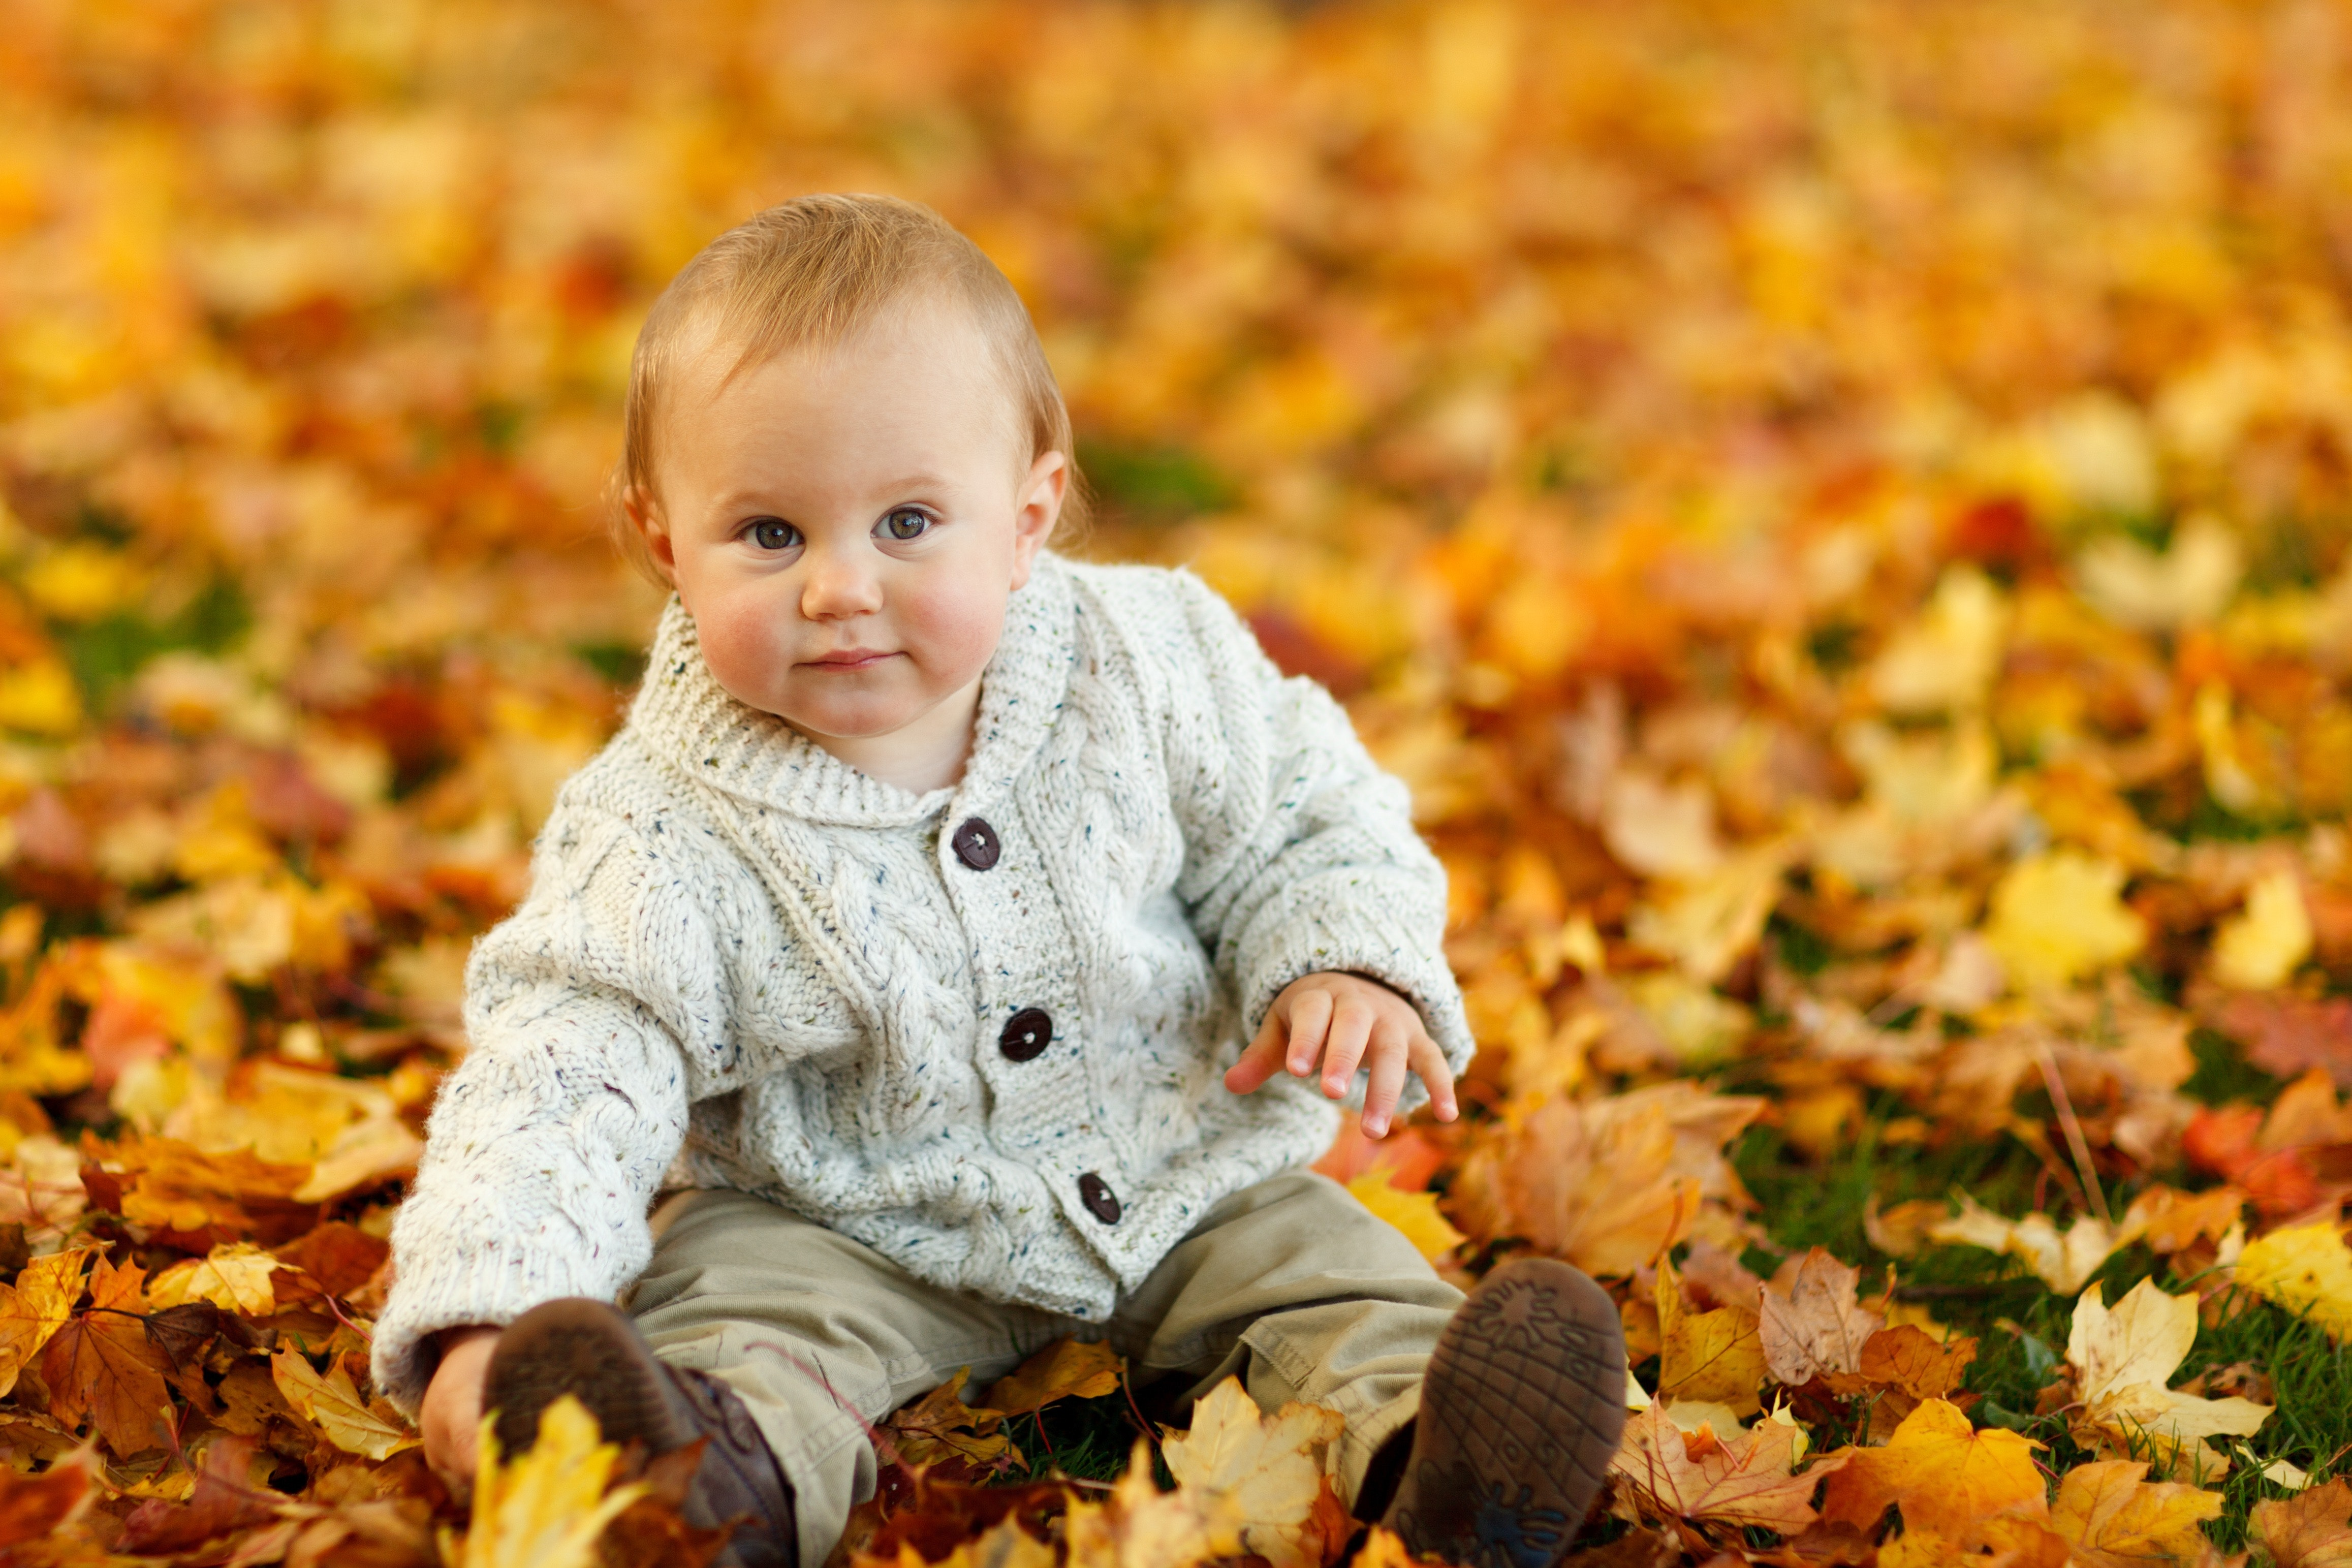 <b>面对疾病频发的秋季,宝宝的身体健康应该从何抓起?</b>